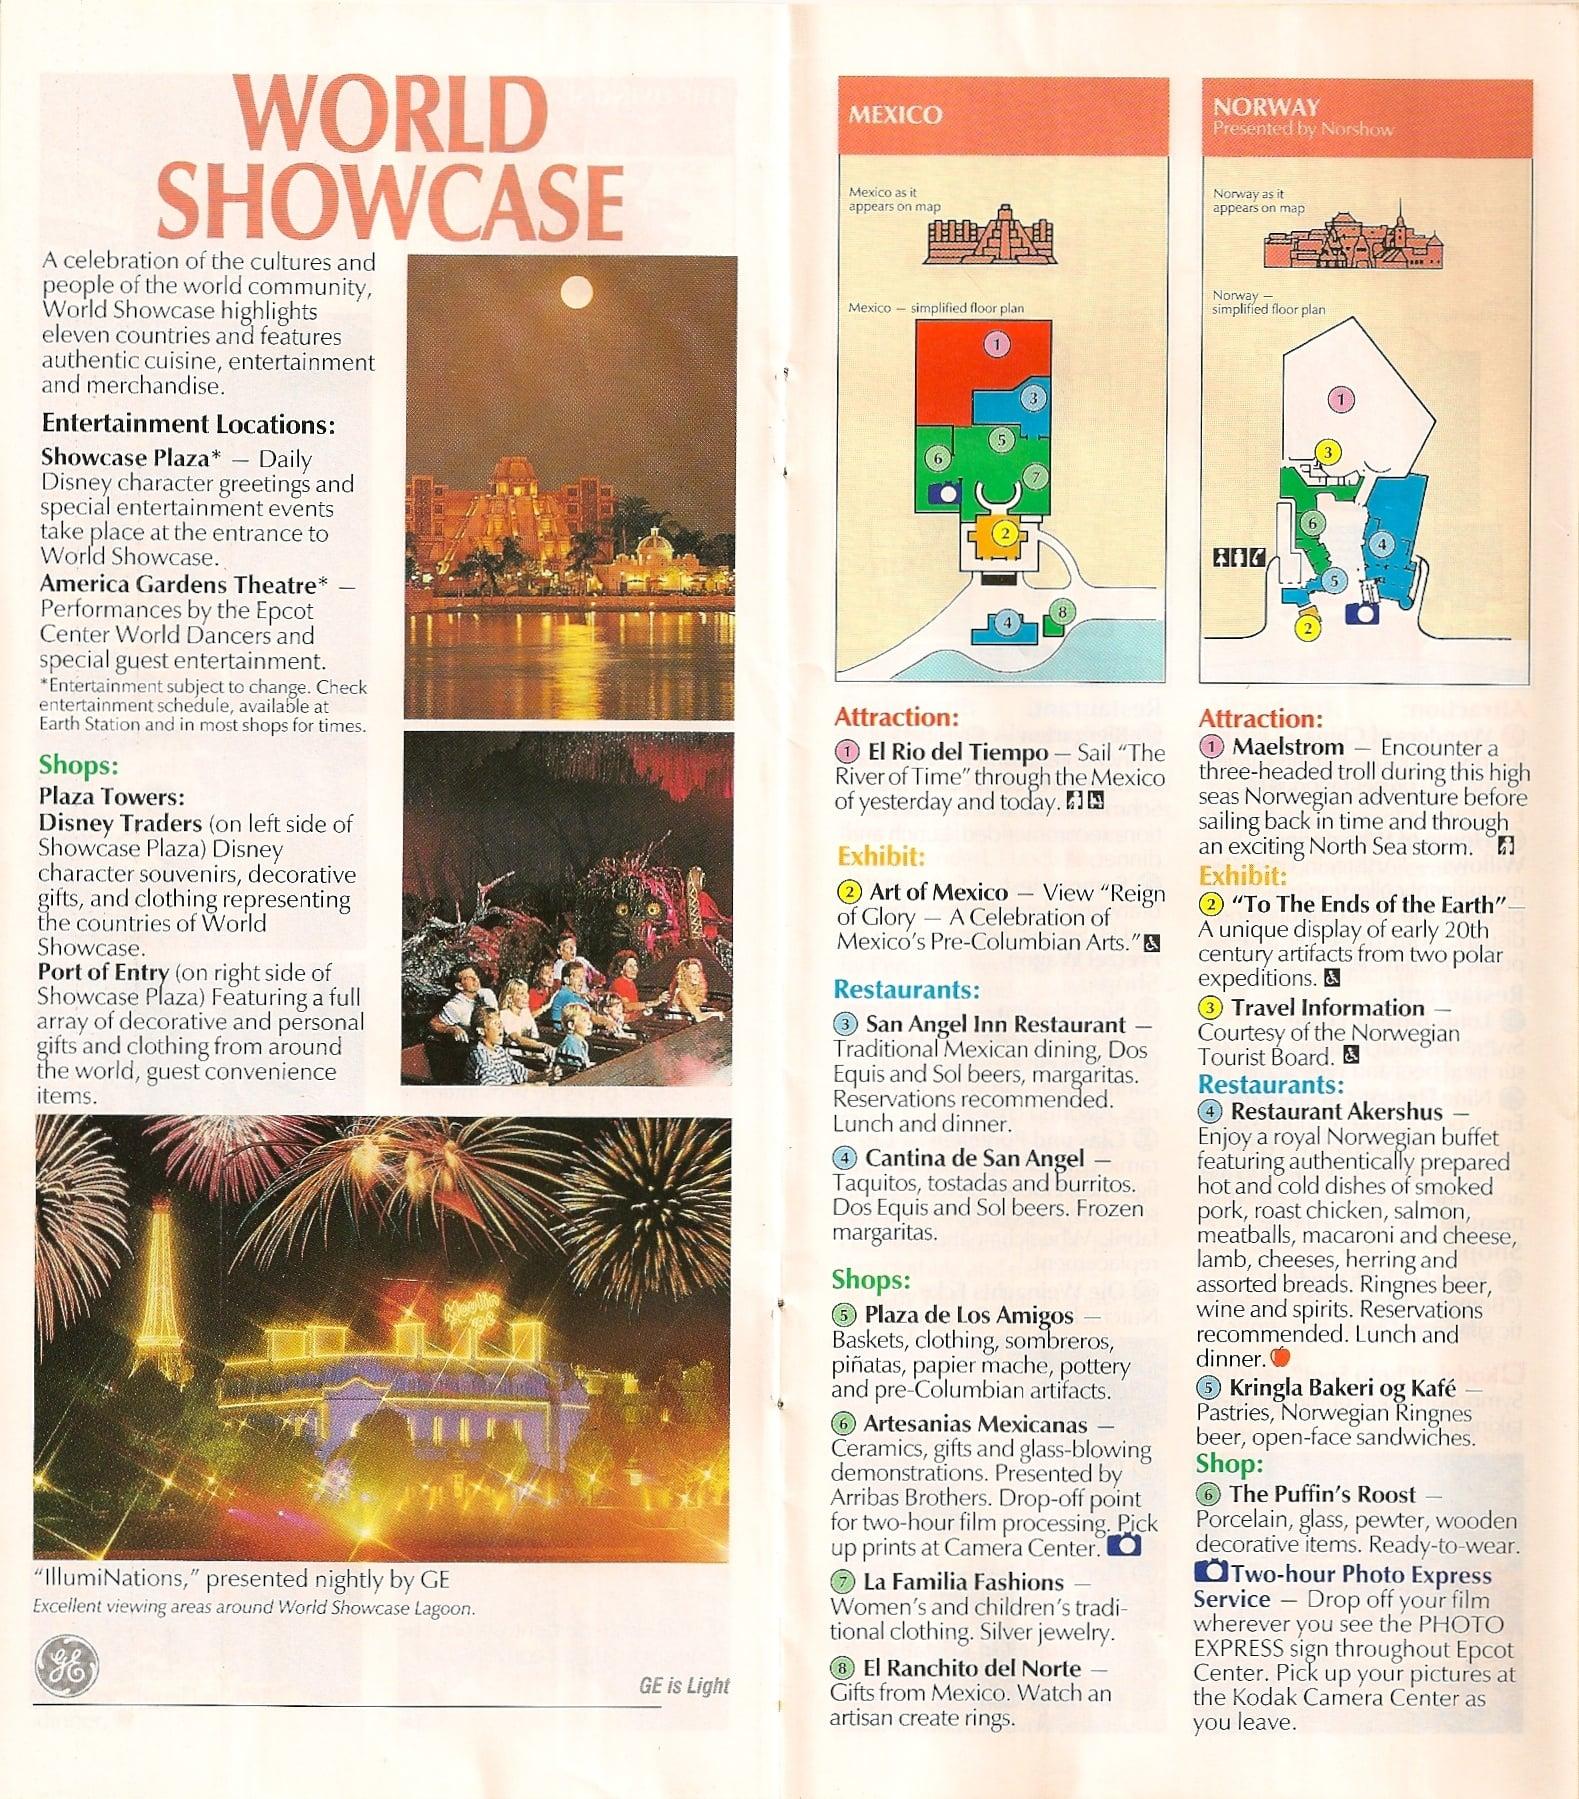 EPCOT Center Tickets & Maps - Disney Tourist Blog